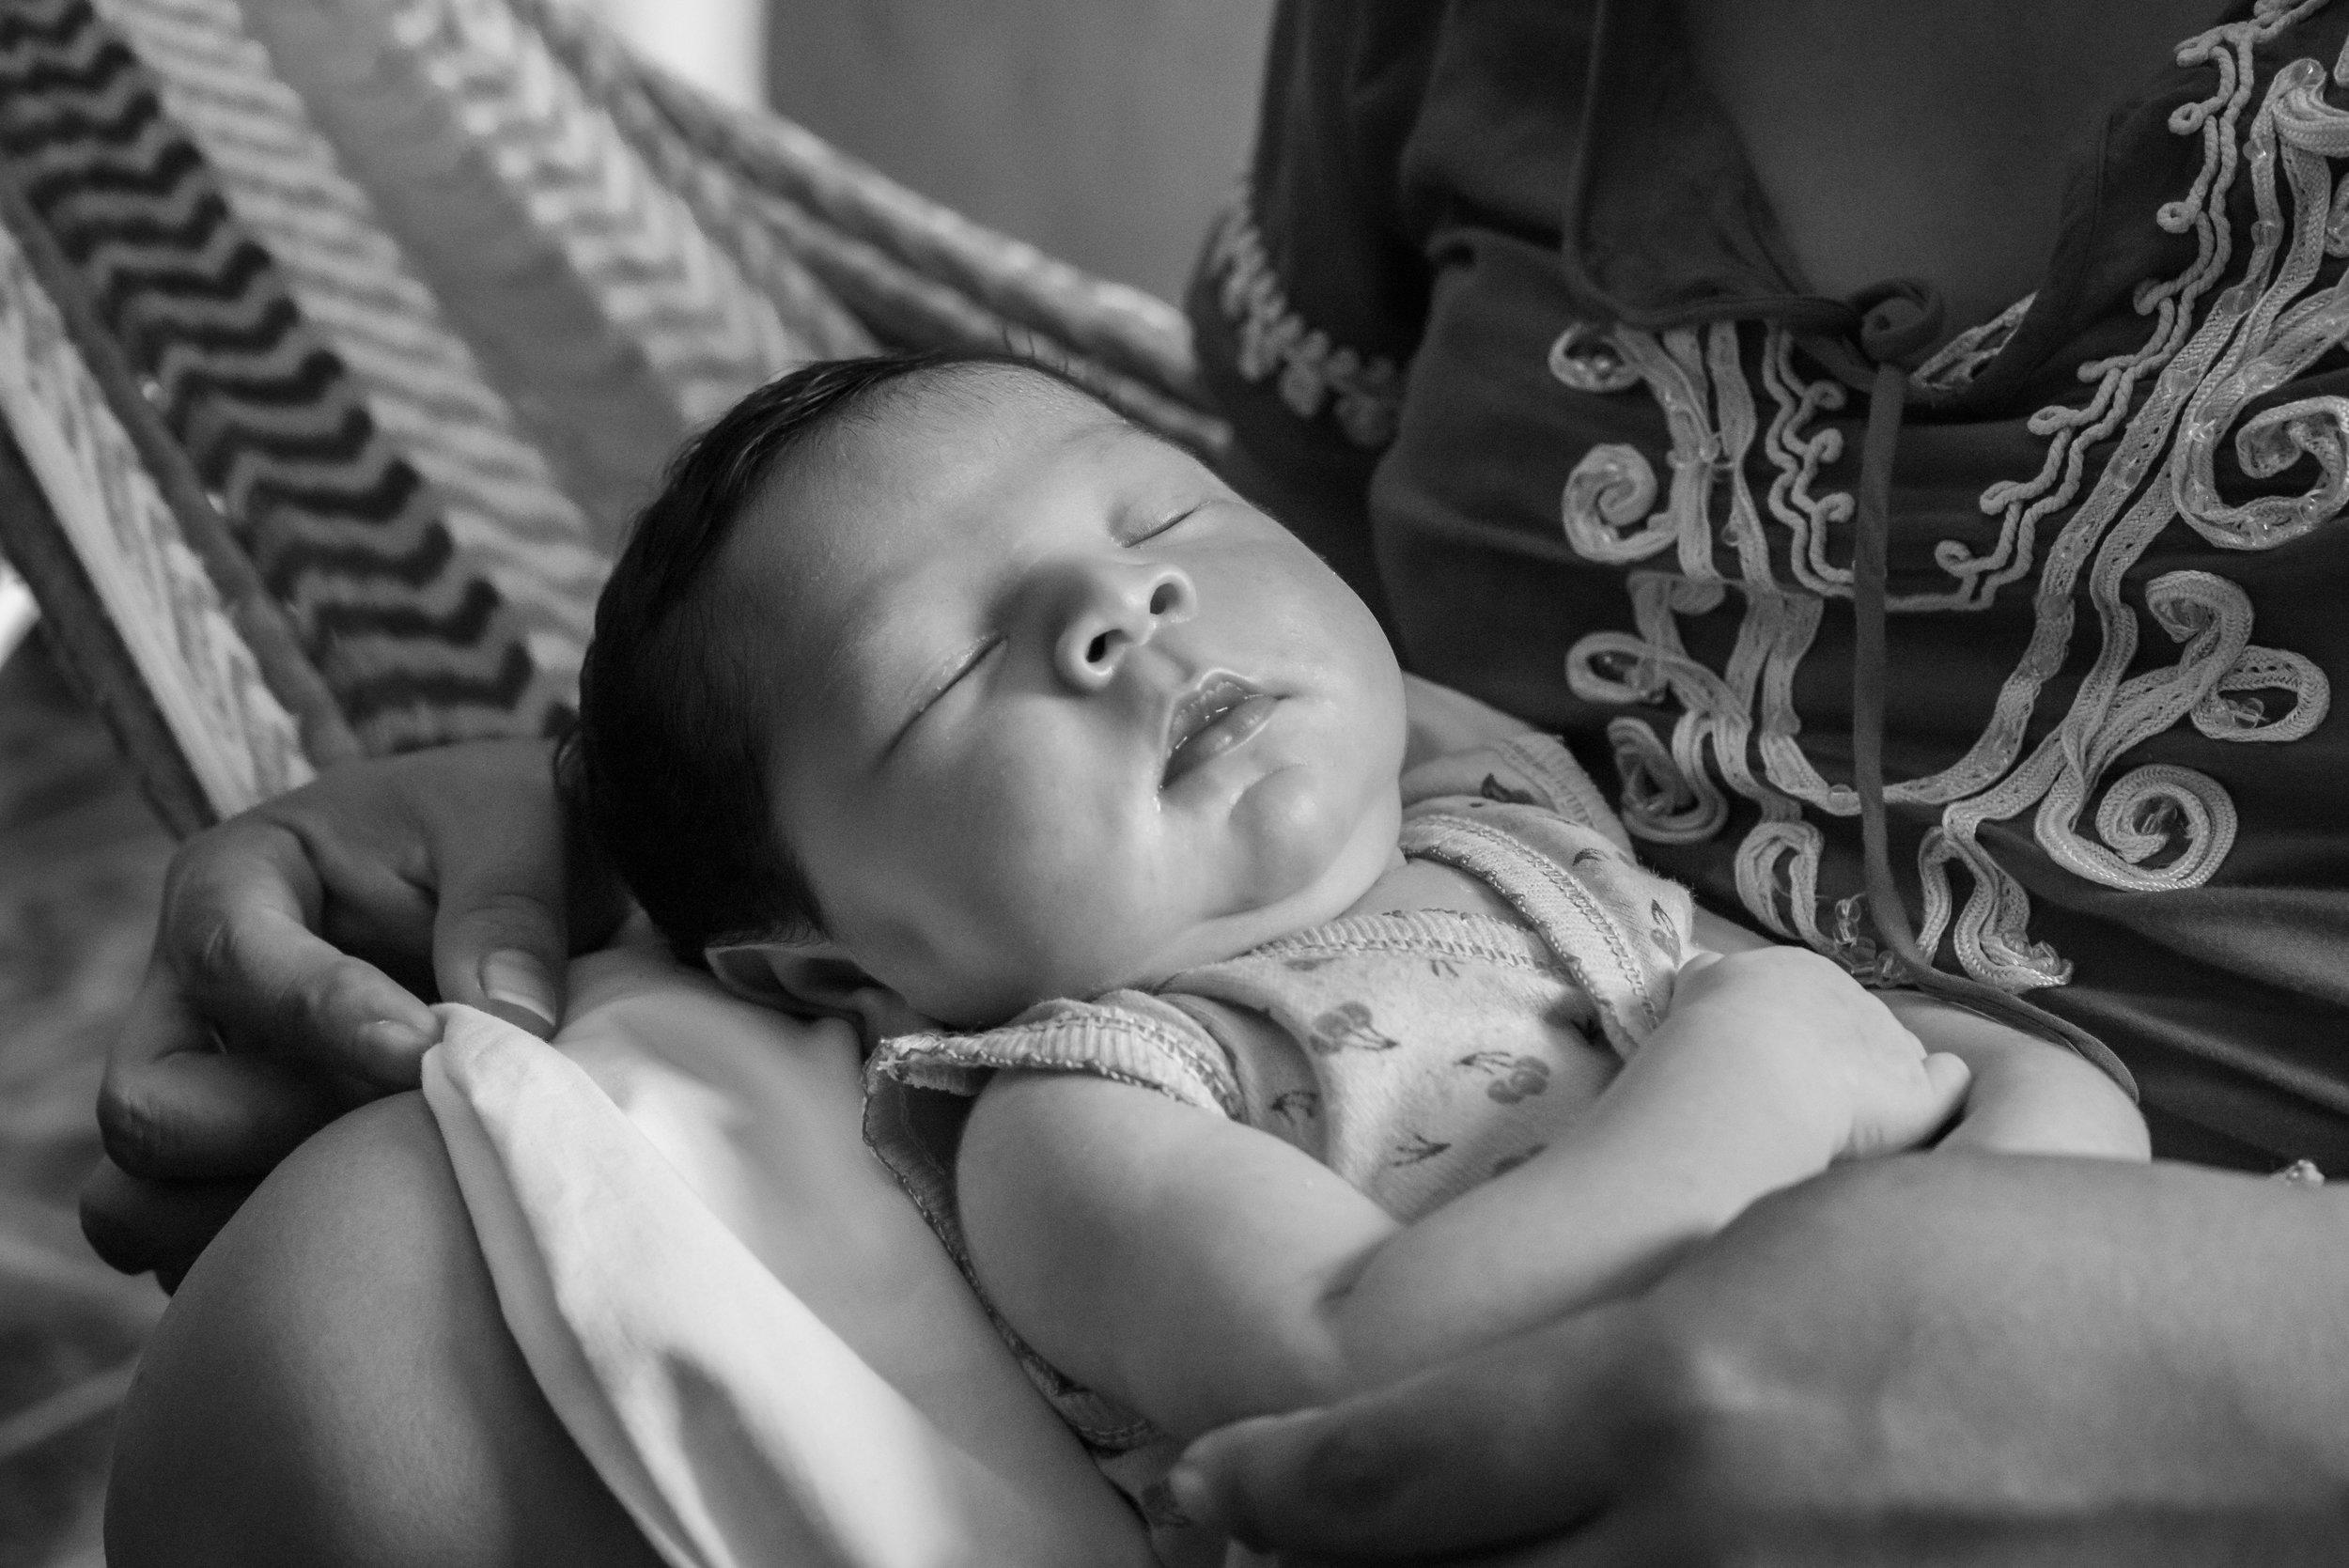 Alinari, 3 weeks